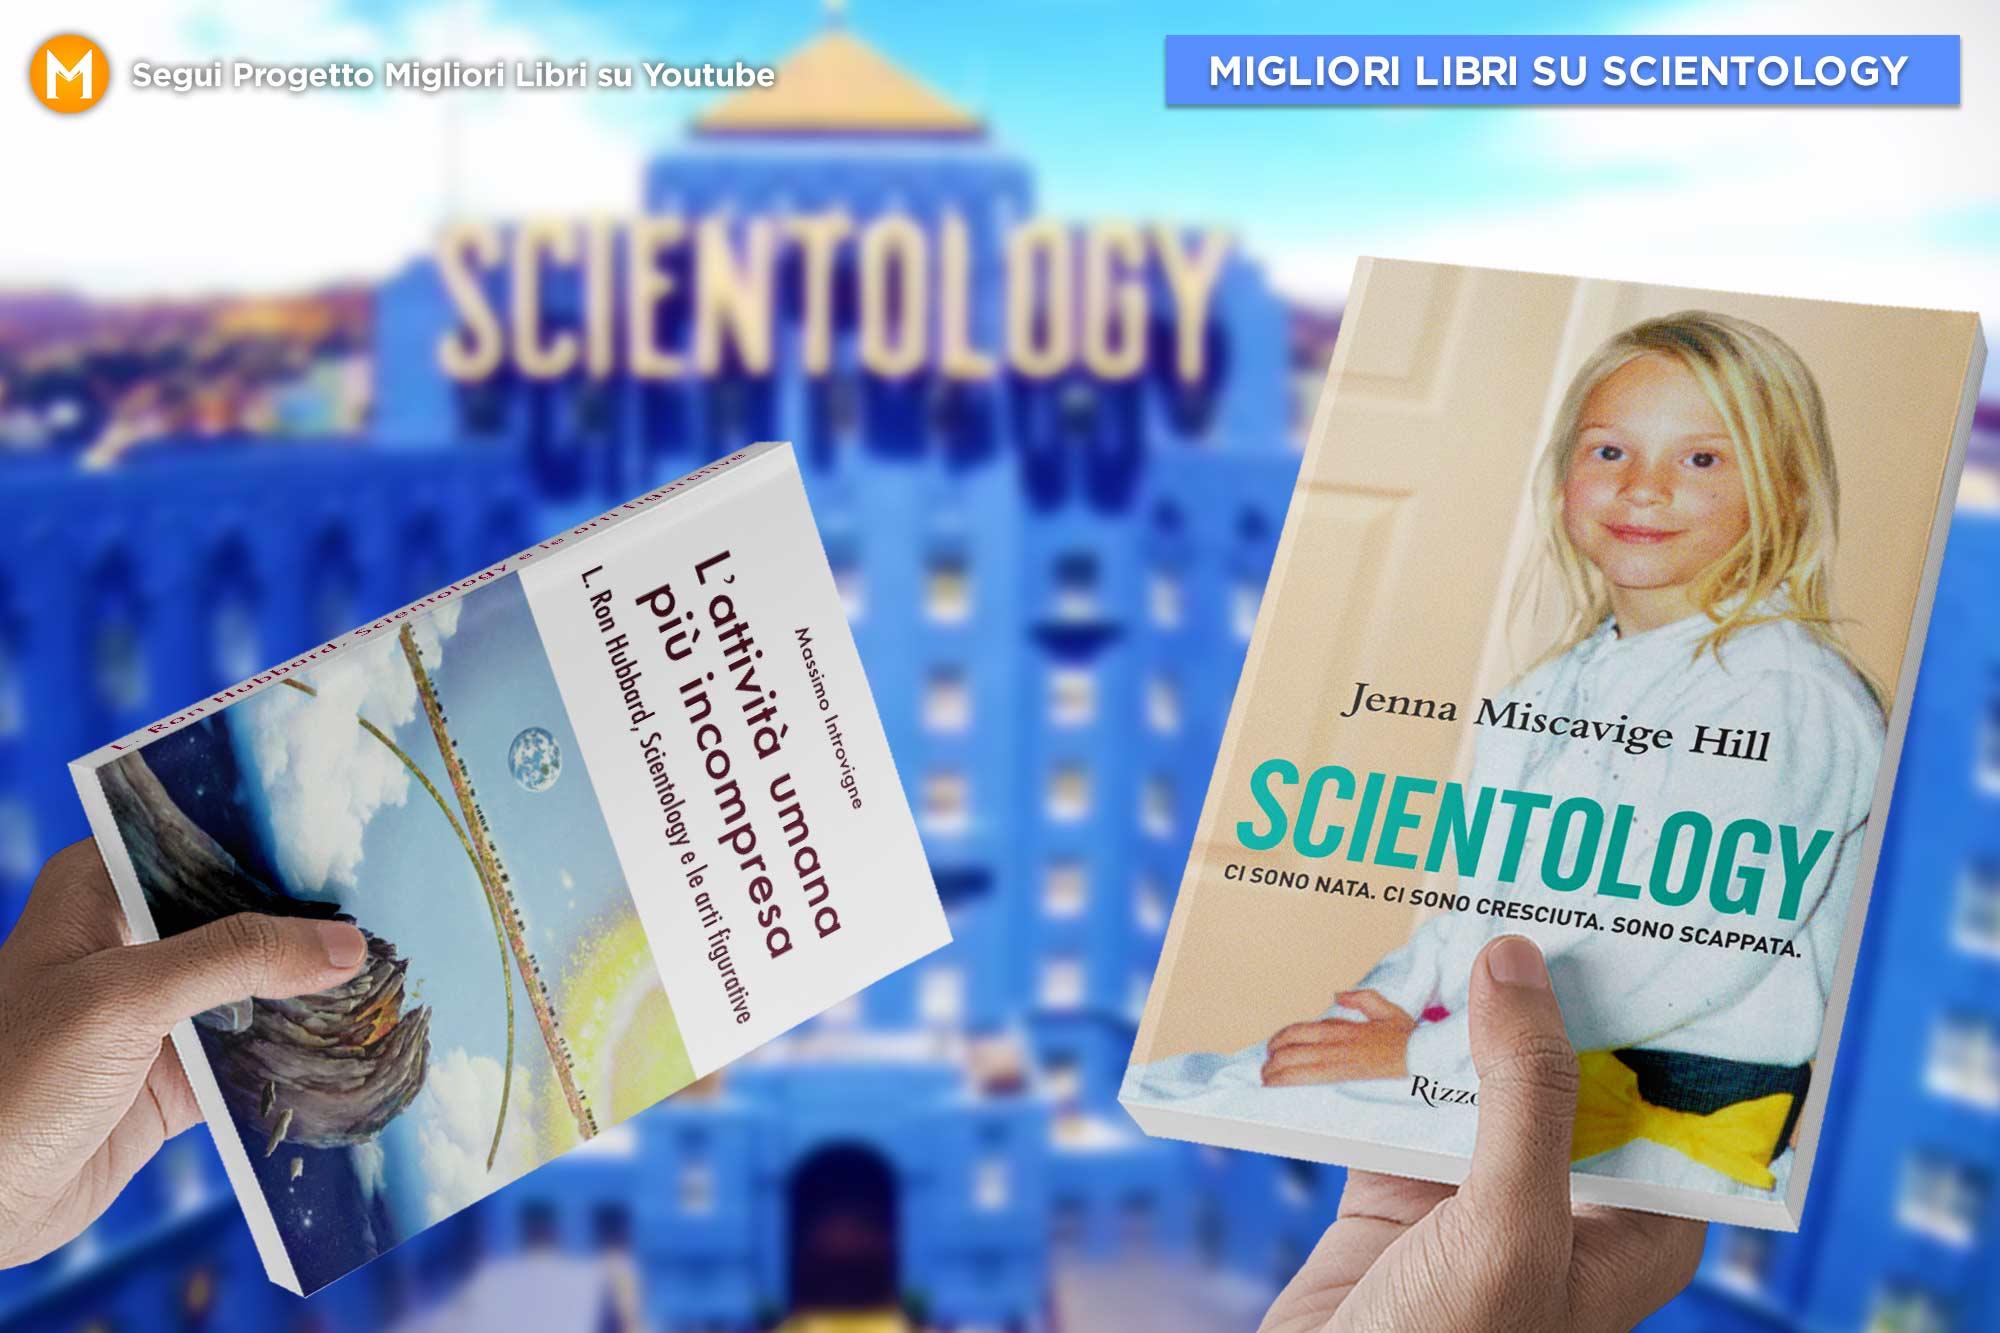 migliori-libri-su-scientology